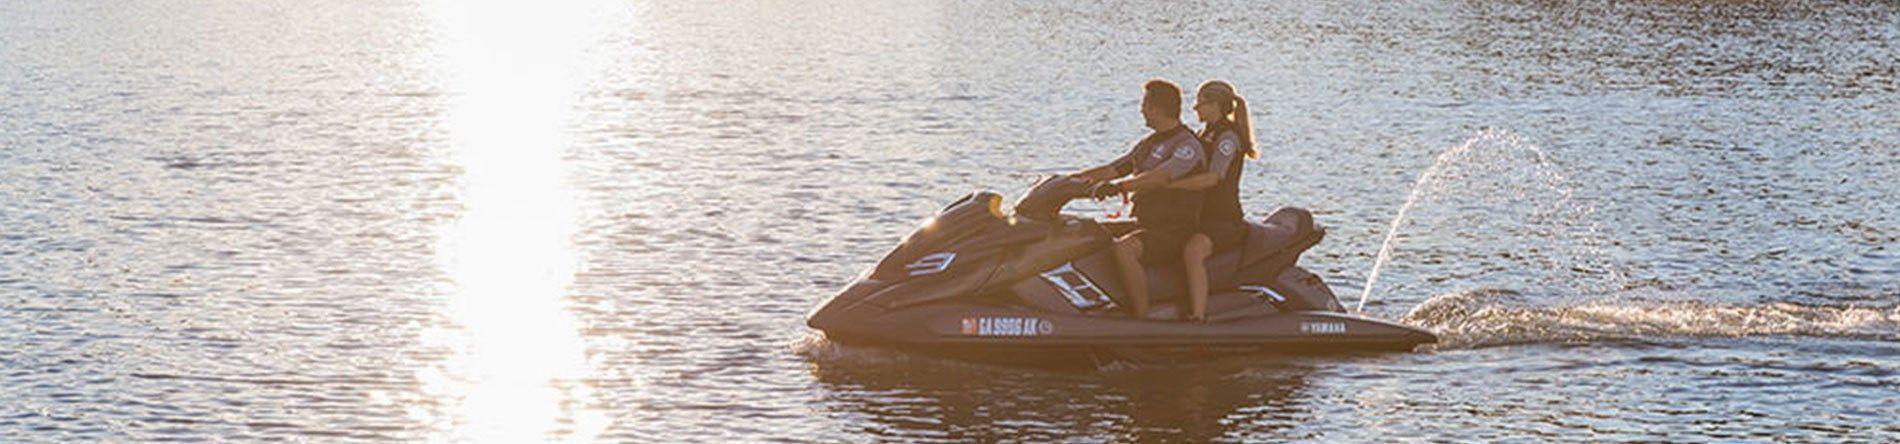 Jet Thrust Performance is your Sea-Doo and Yamaha Watercraft